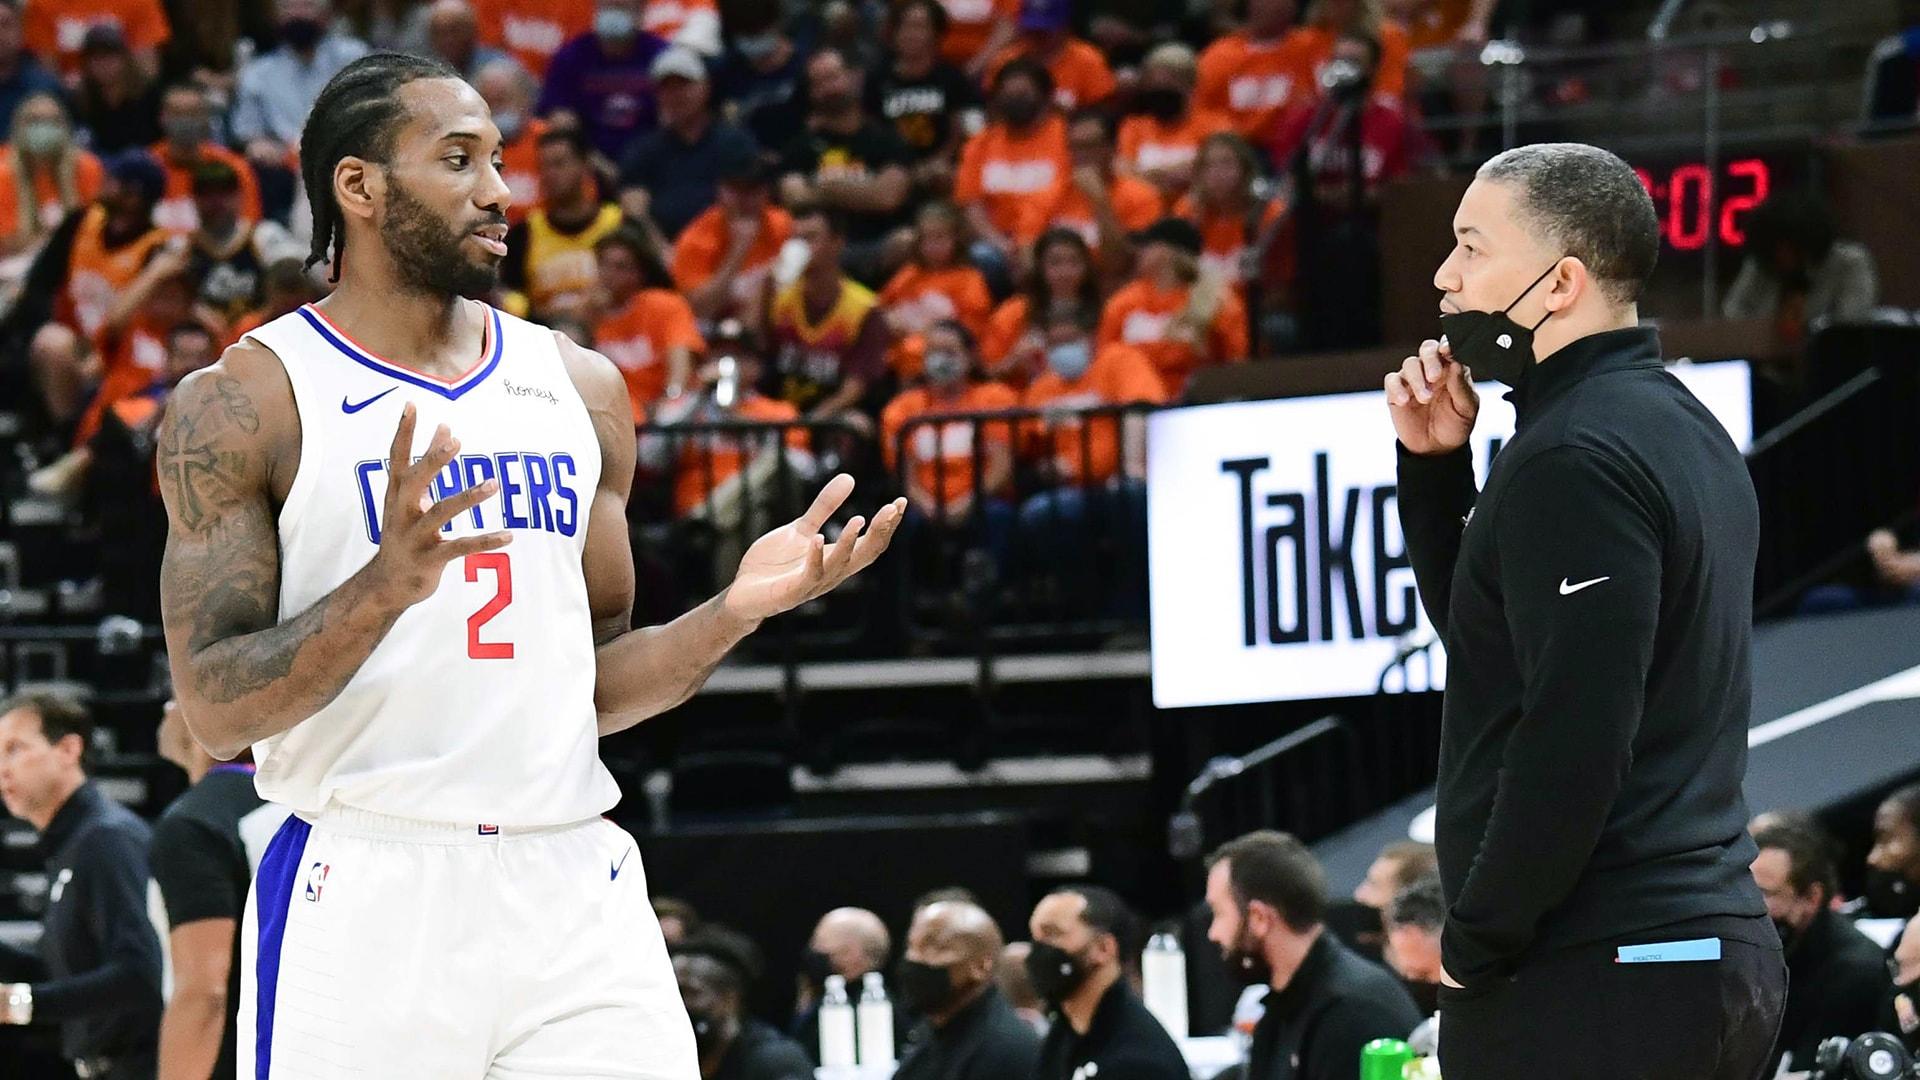 ICYMI: News rush sends shockwaves through NBA